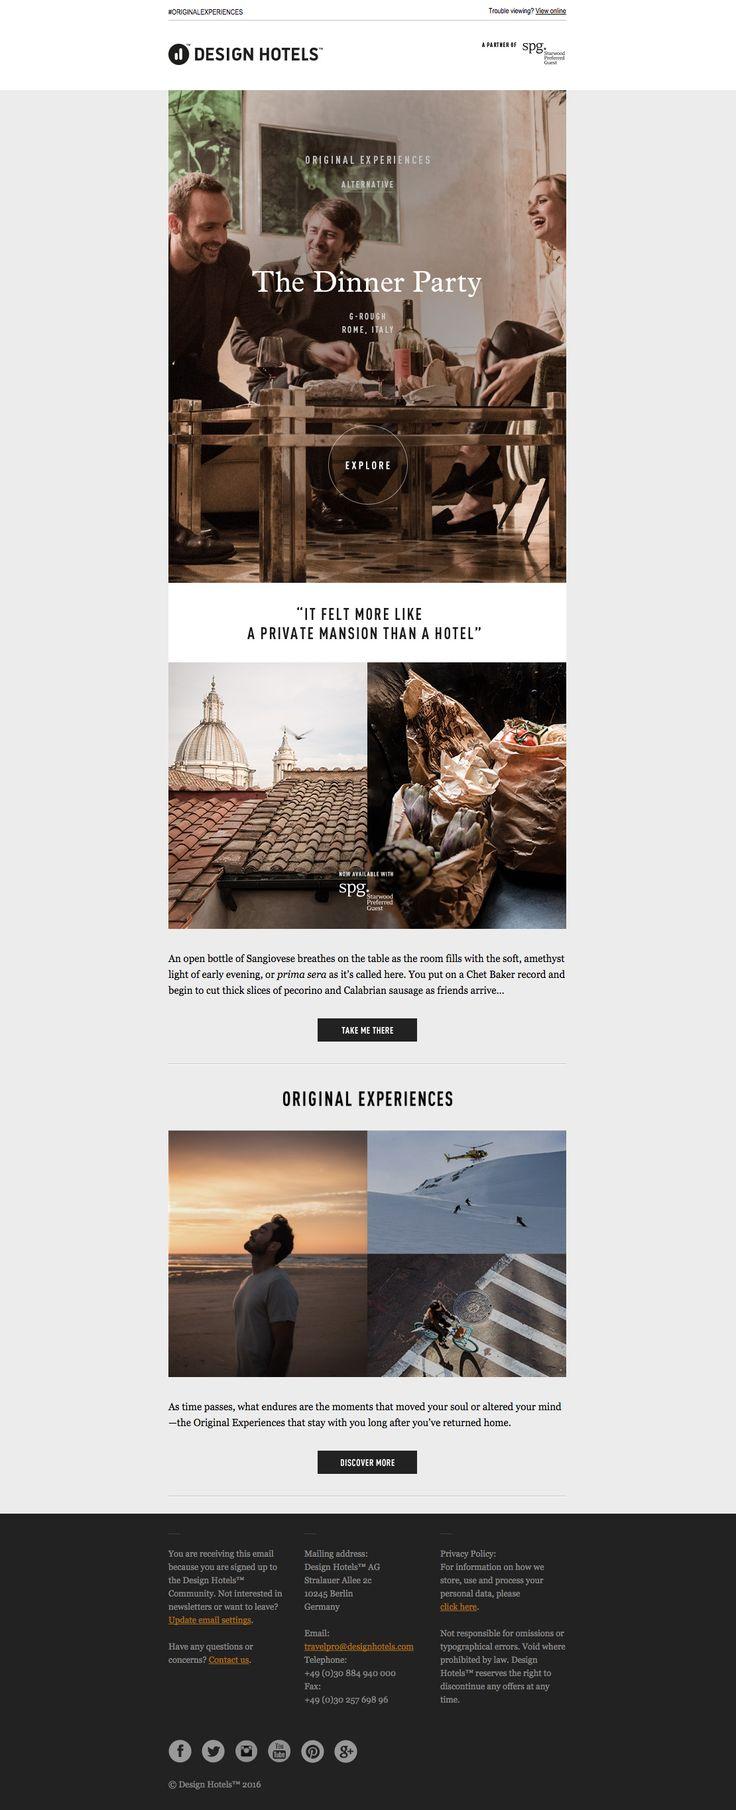 design hotels newsletter